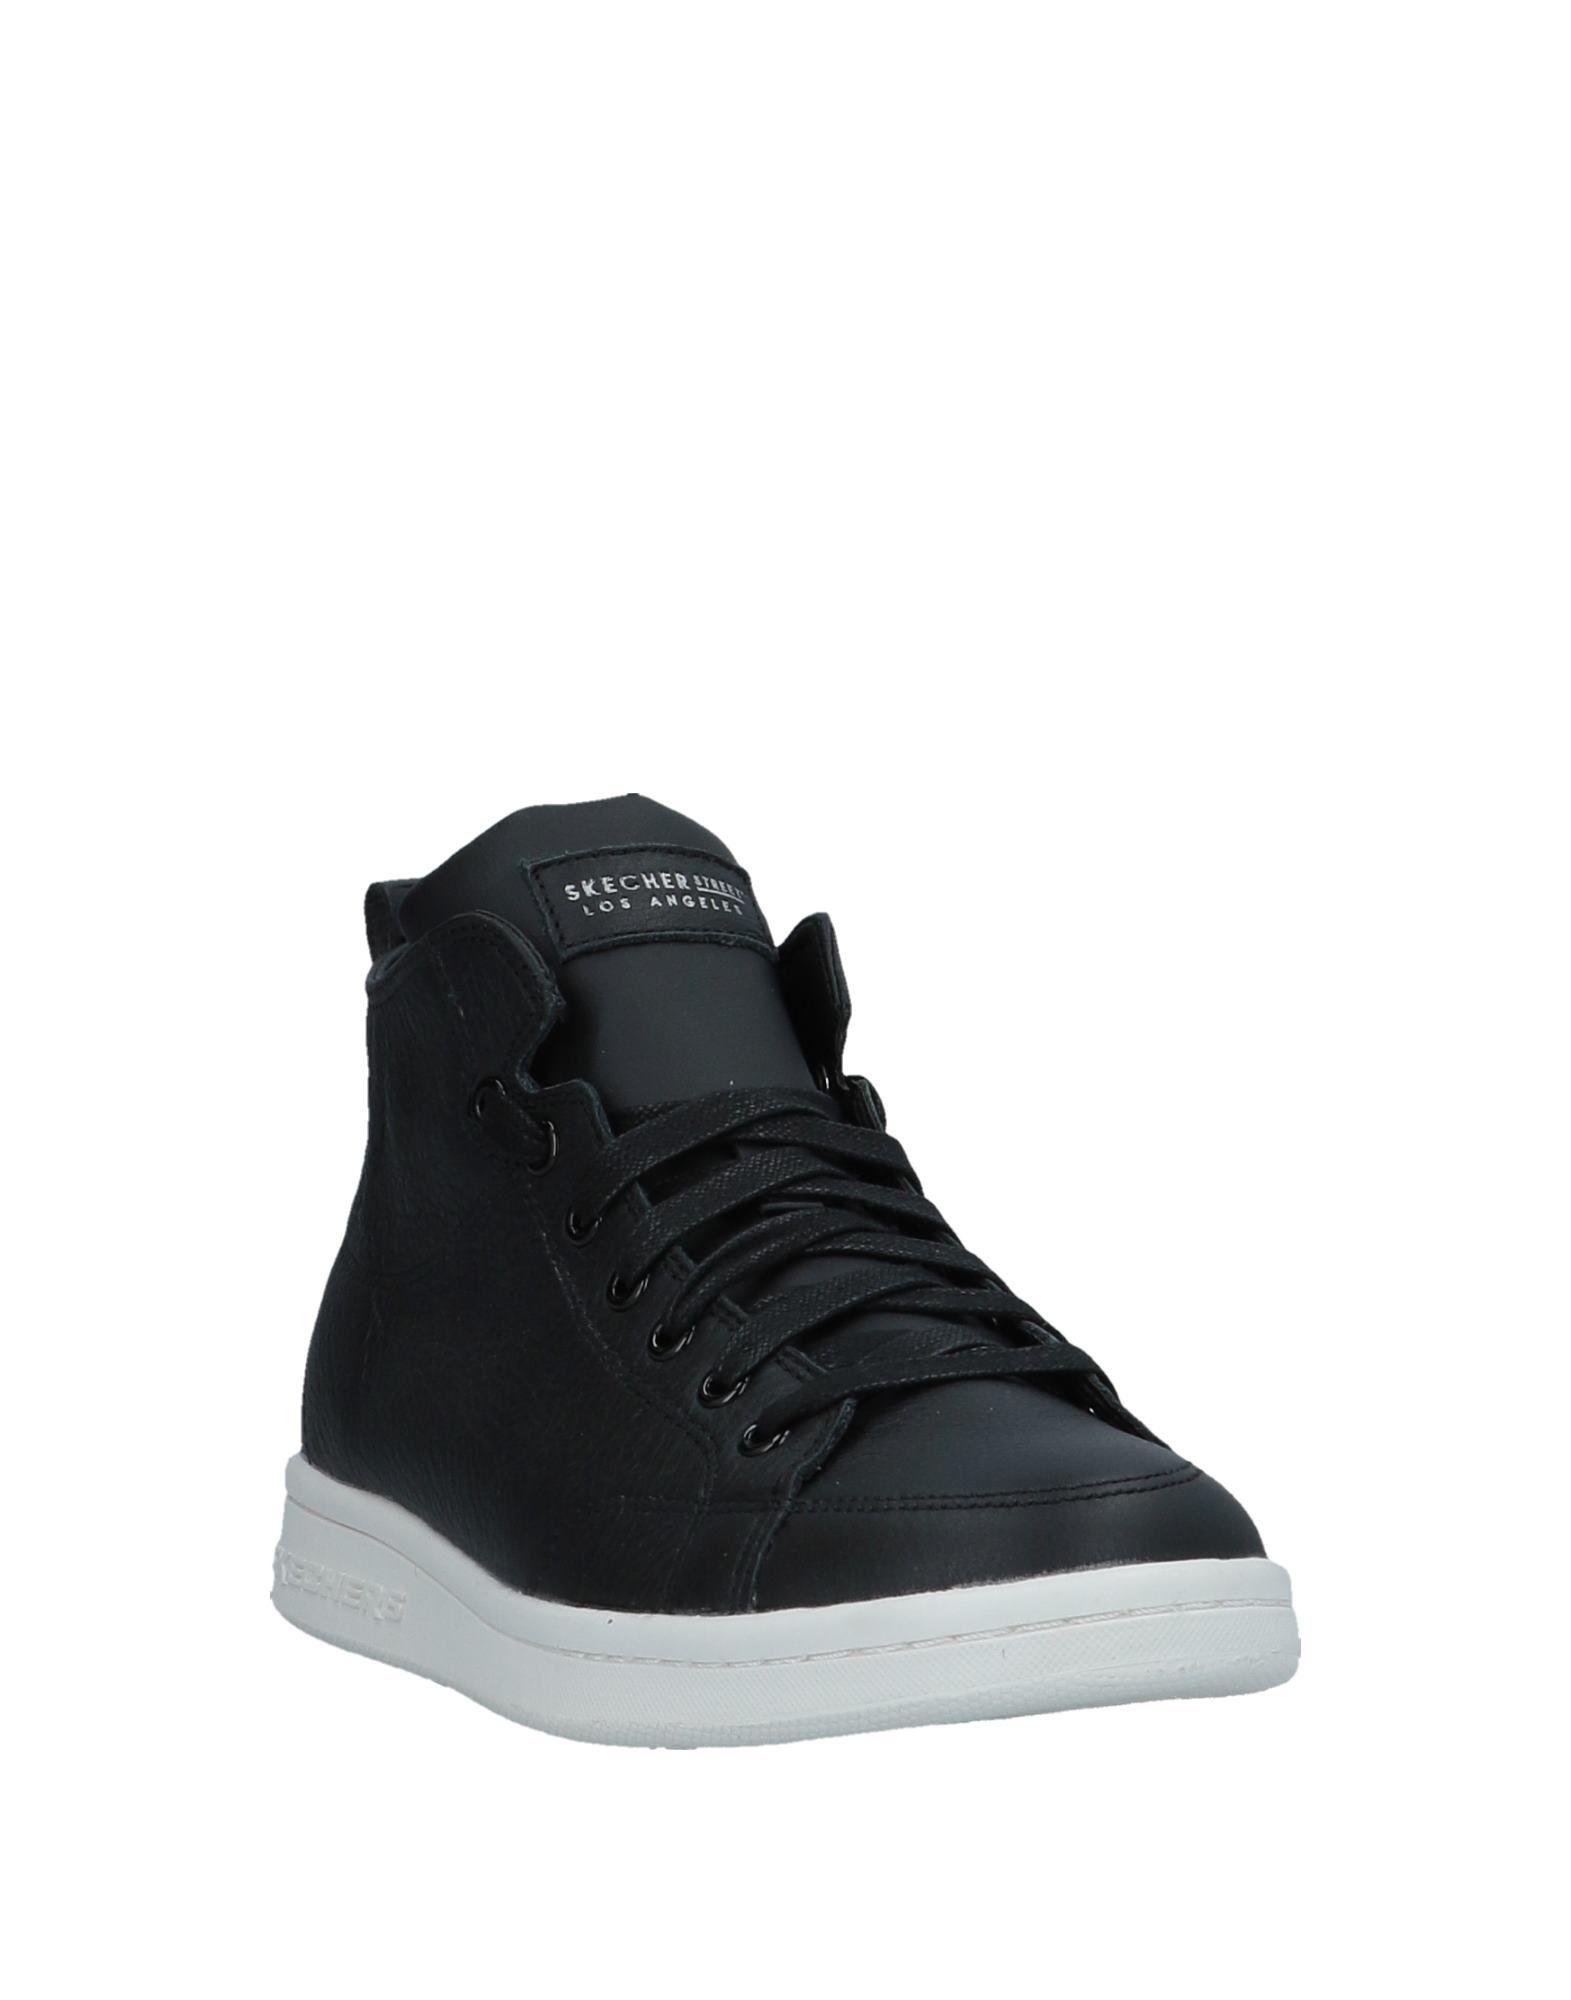 Skechers Sneakers Damen  11529194KK 11529194KK  767903